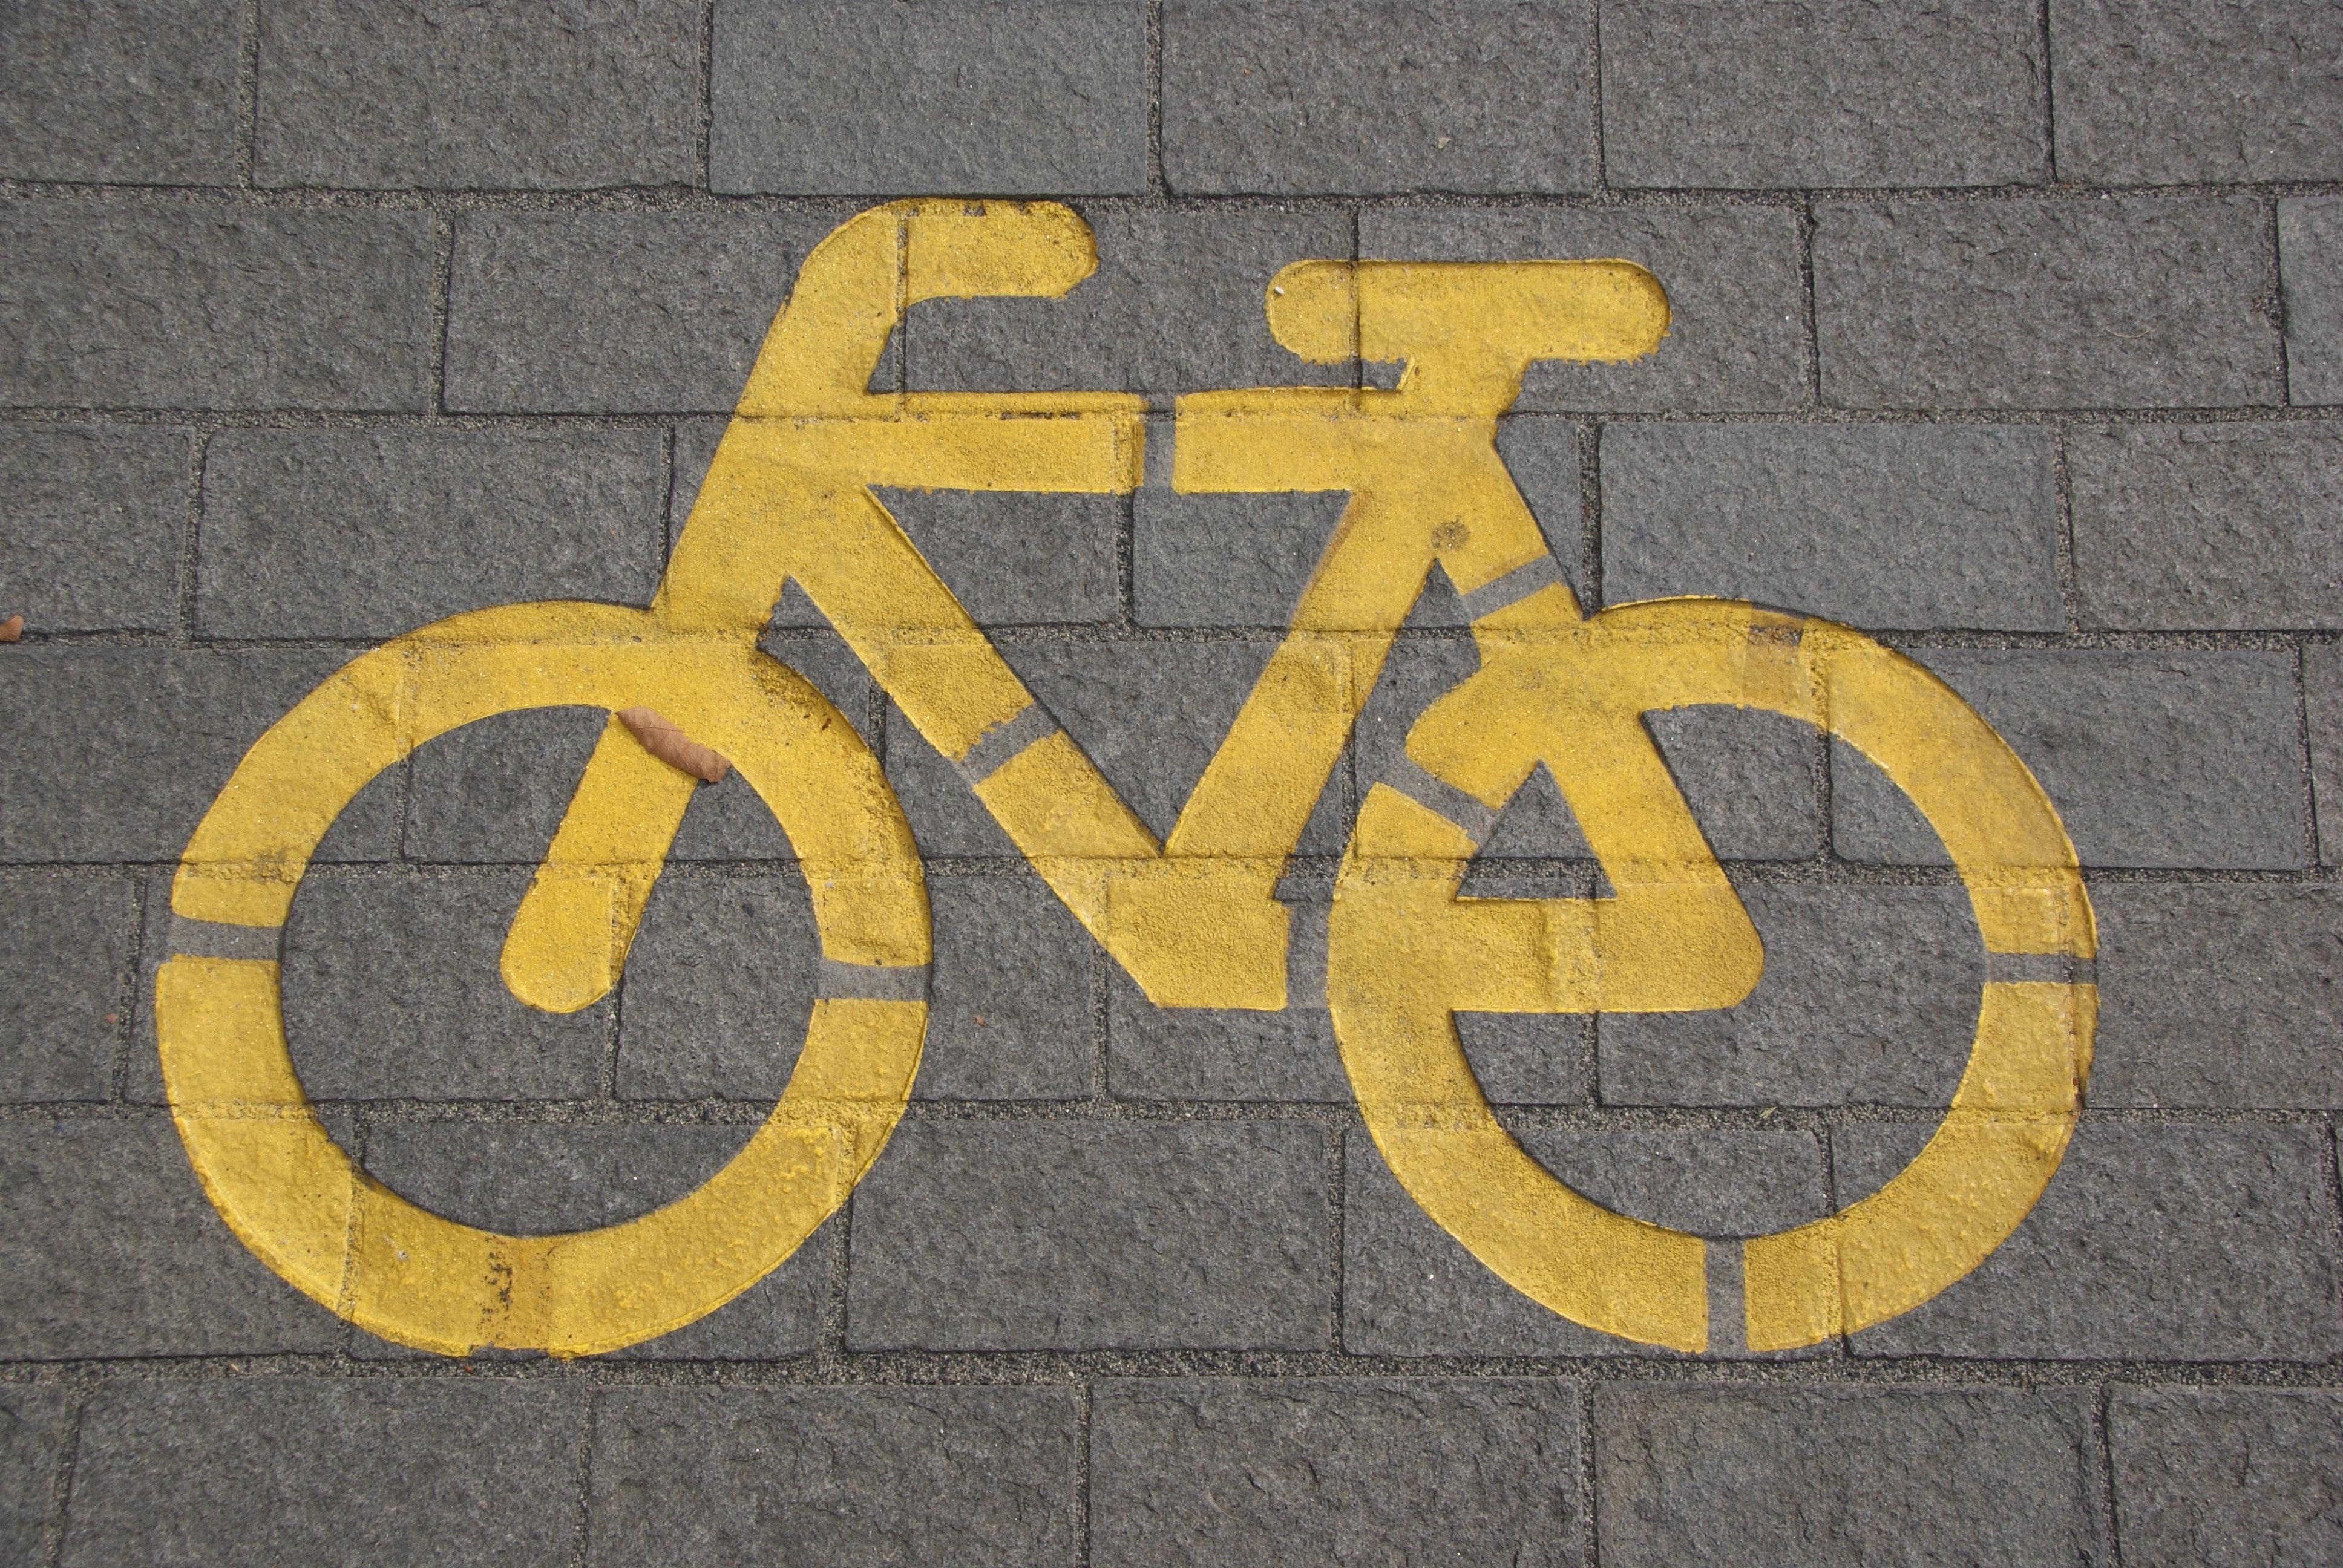 Bicycle lane on gray concrete road photo